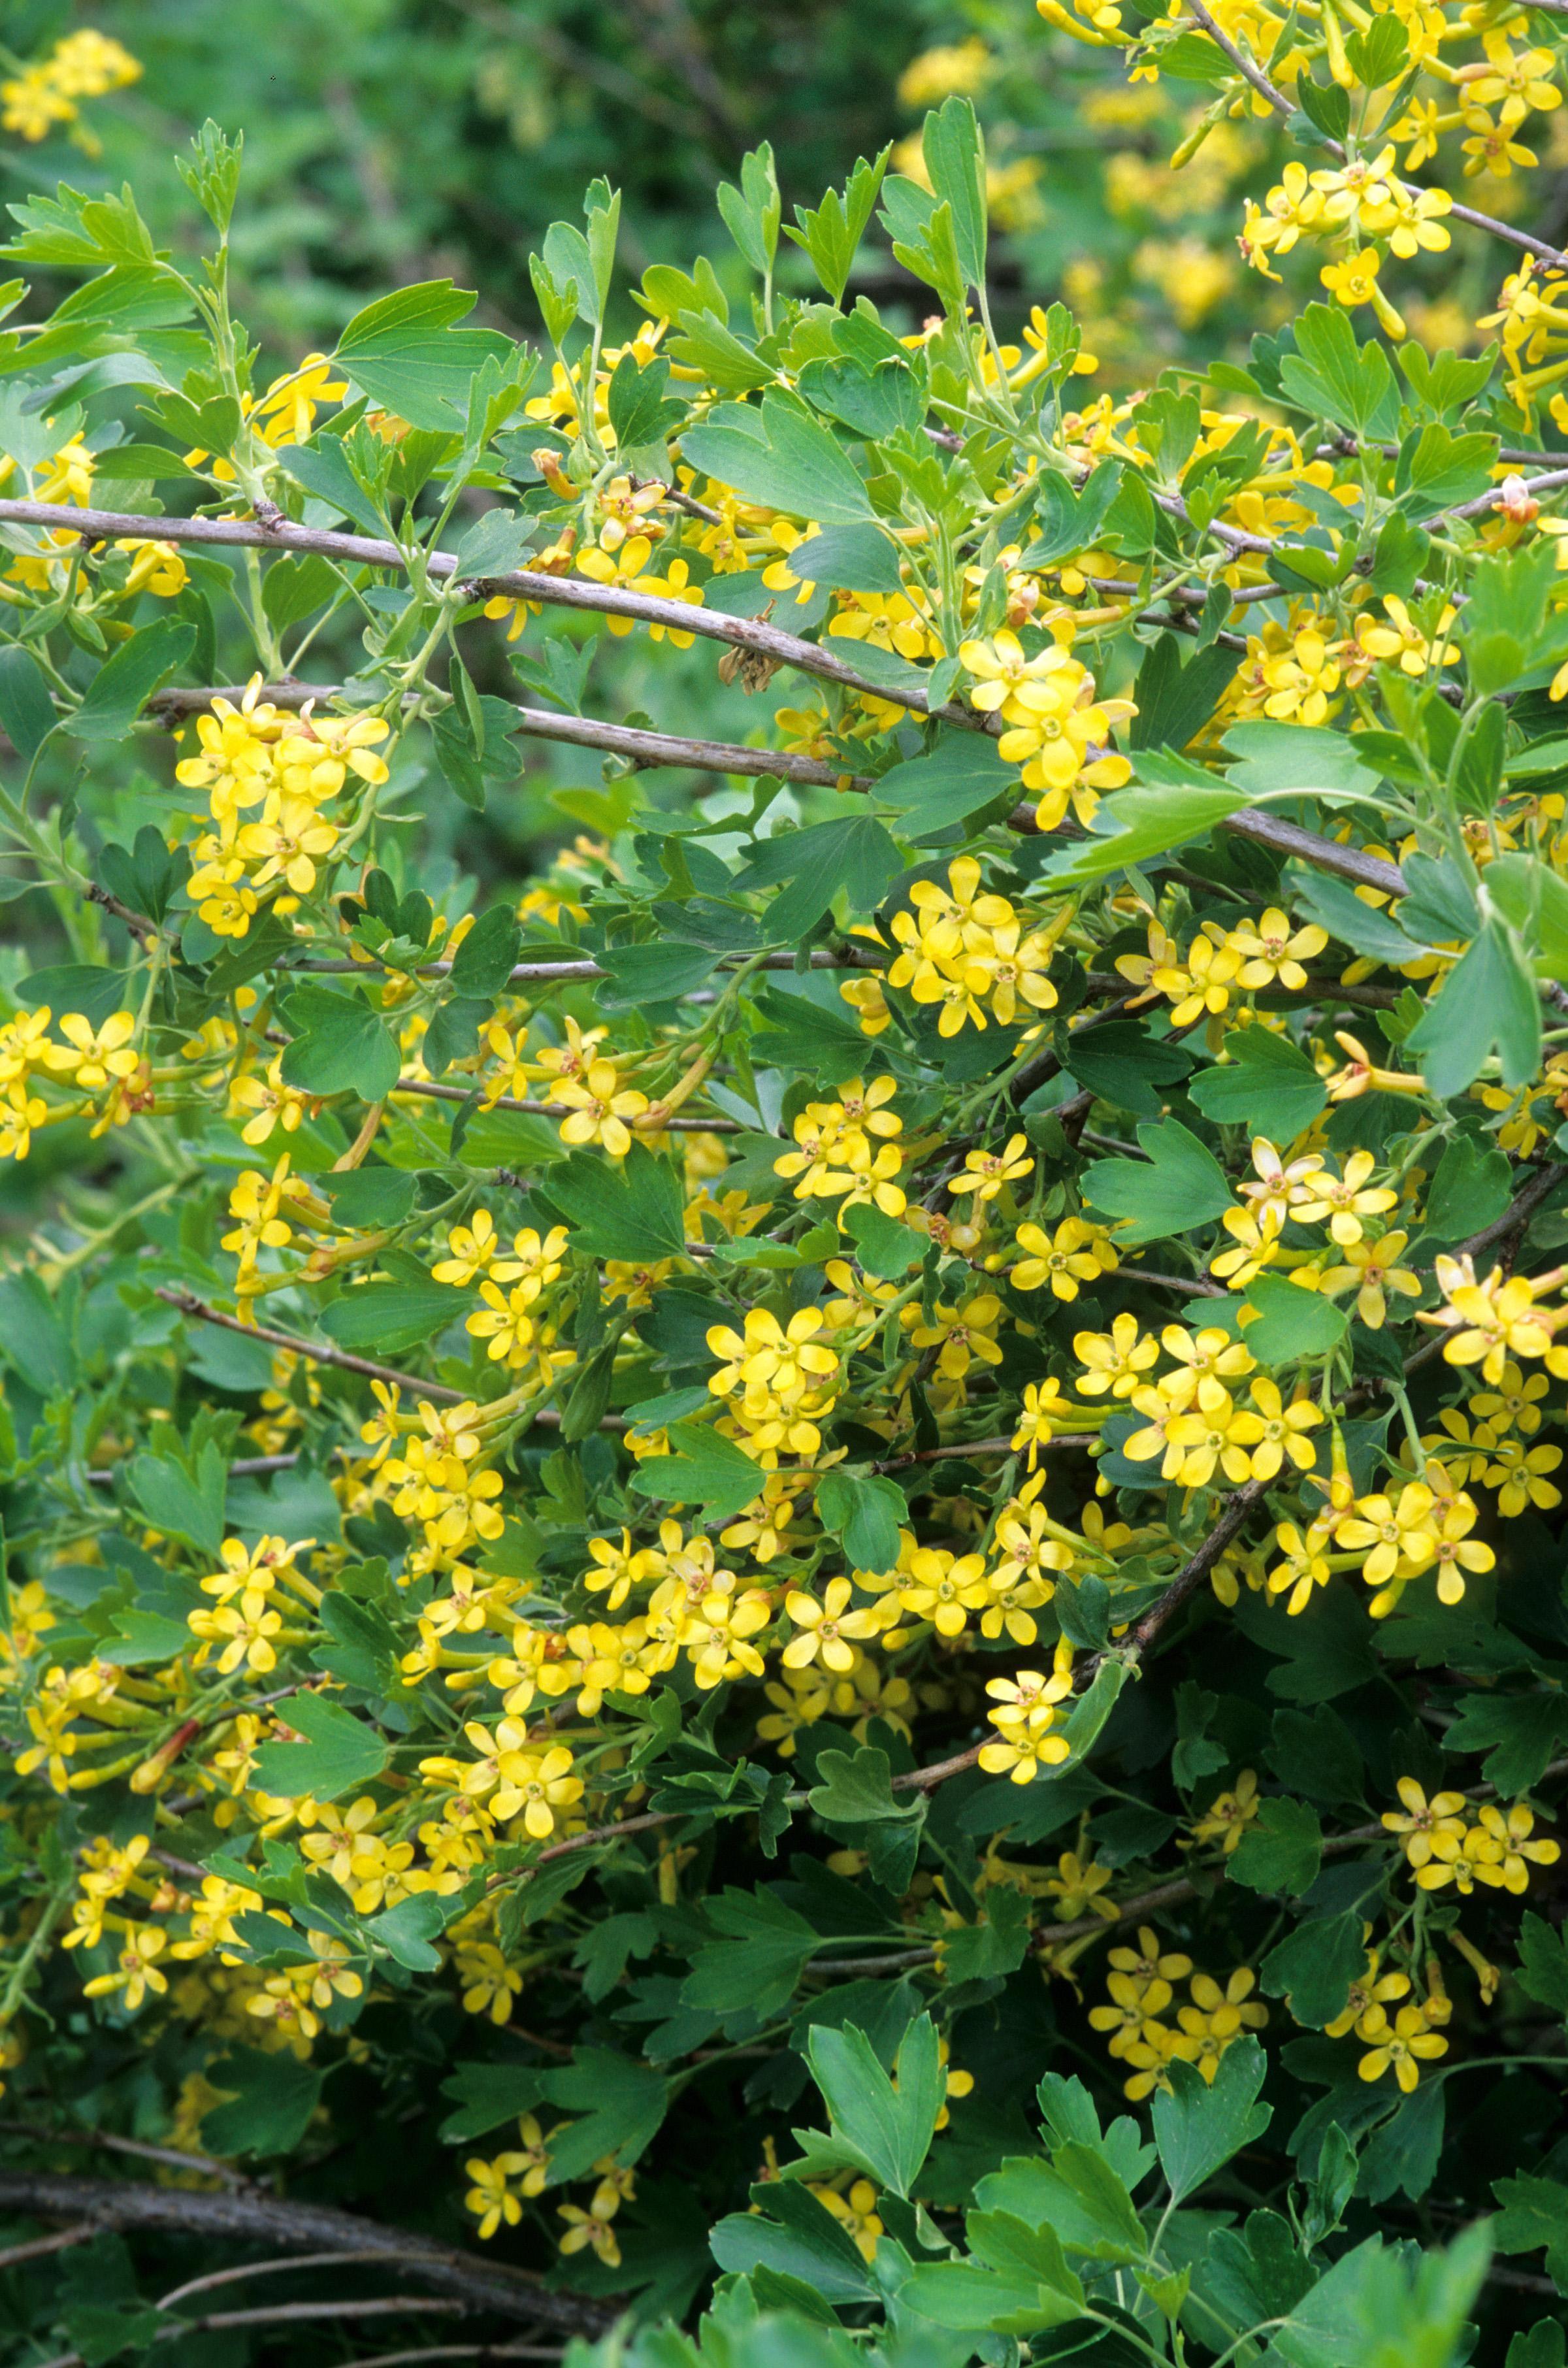 Currant Yellow Flowering Thetreefarm